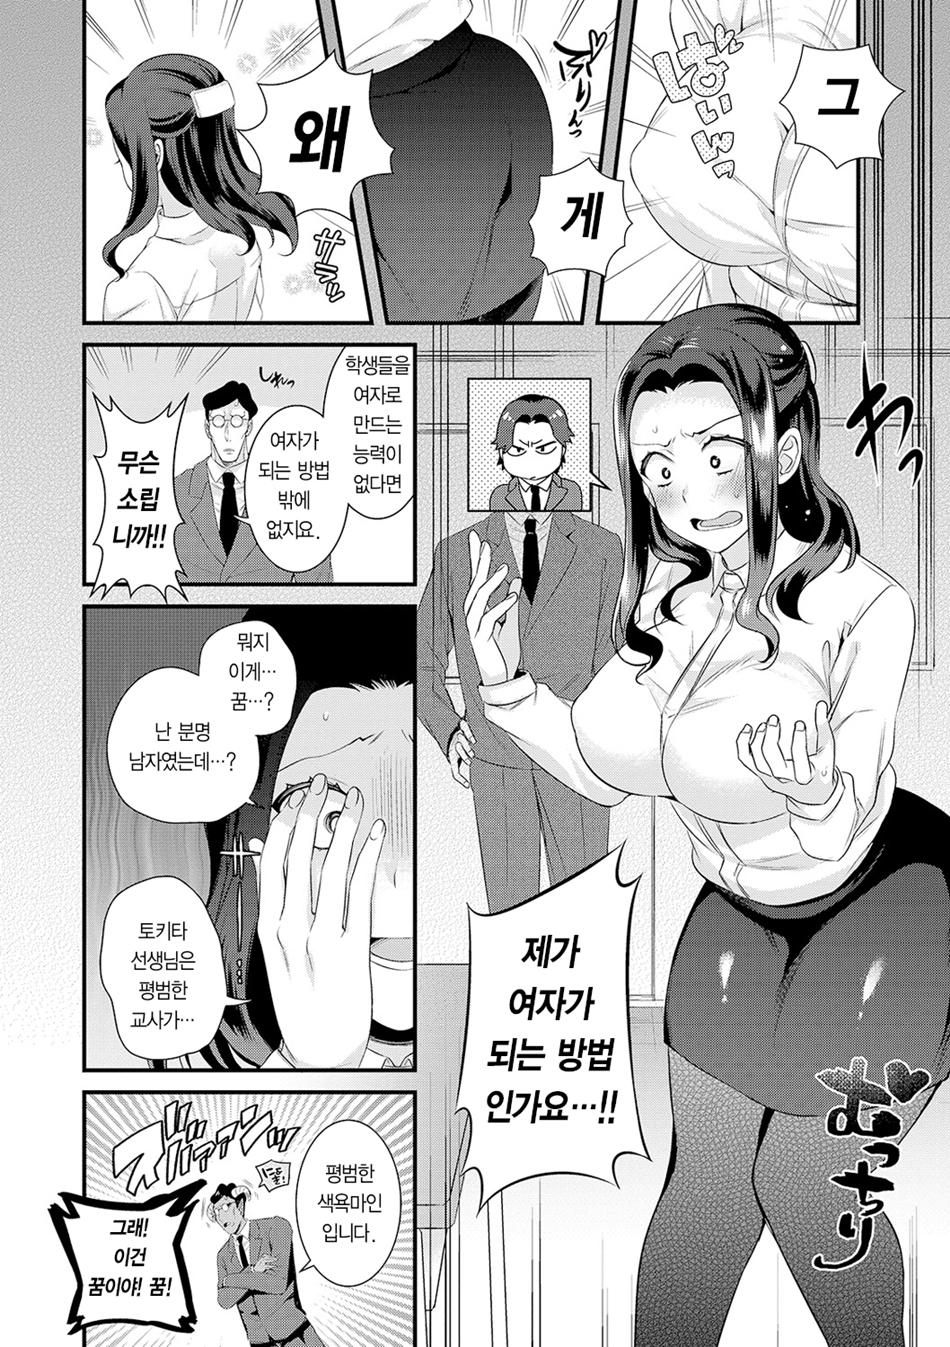 022_page_22_1.jpg